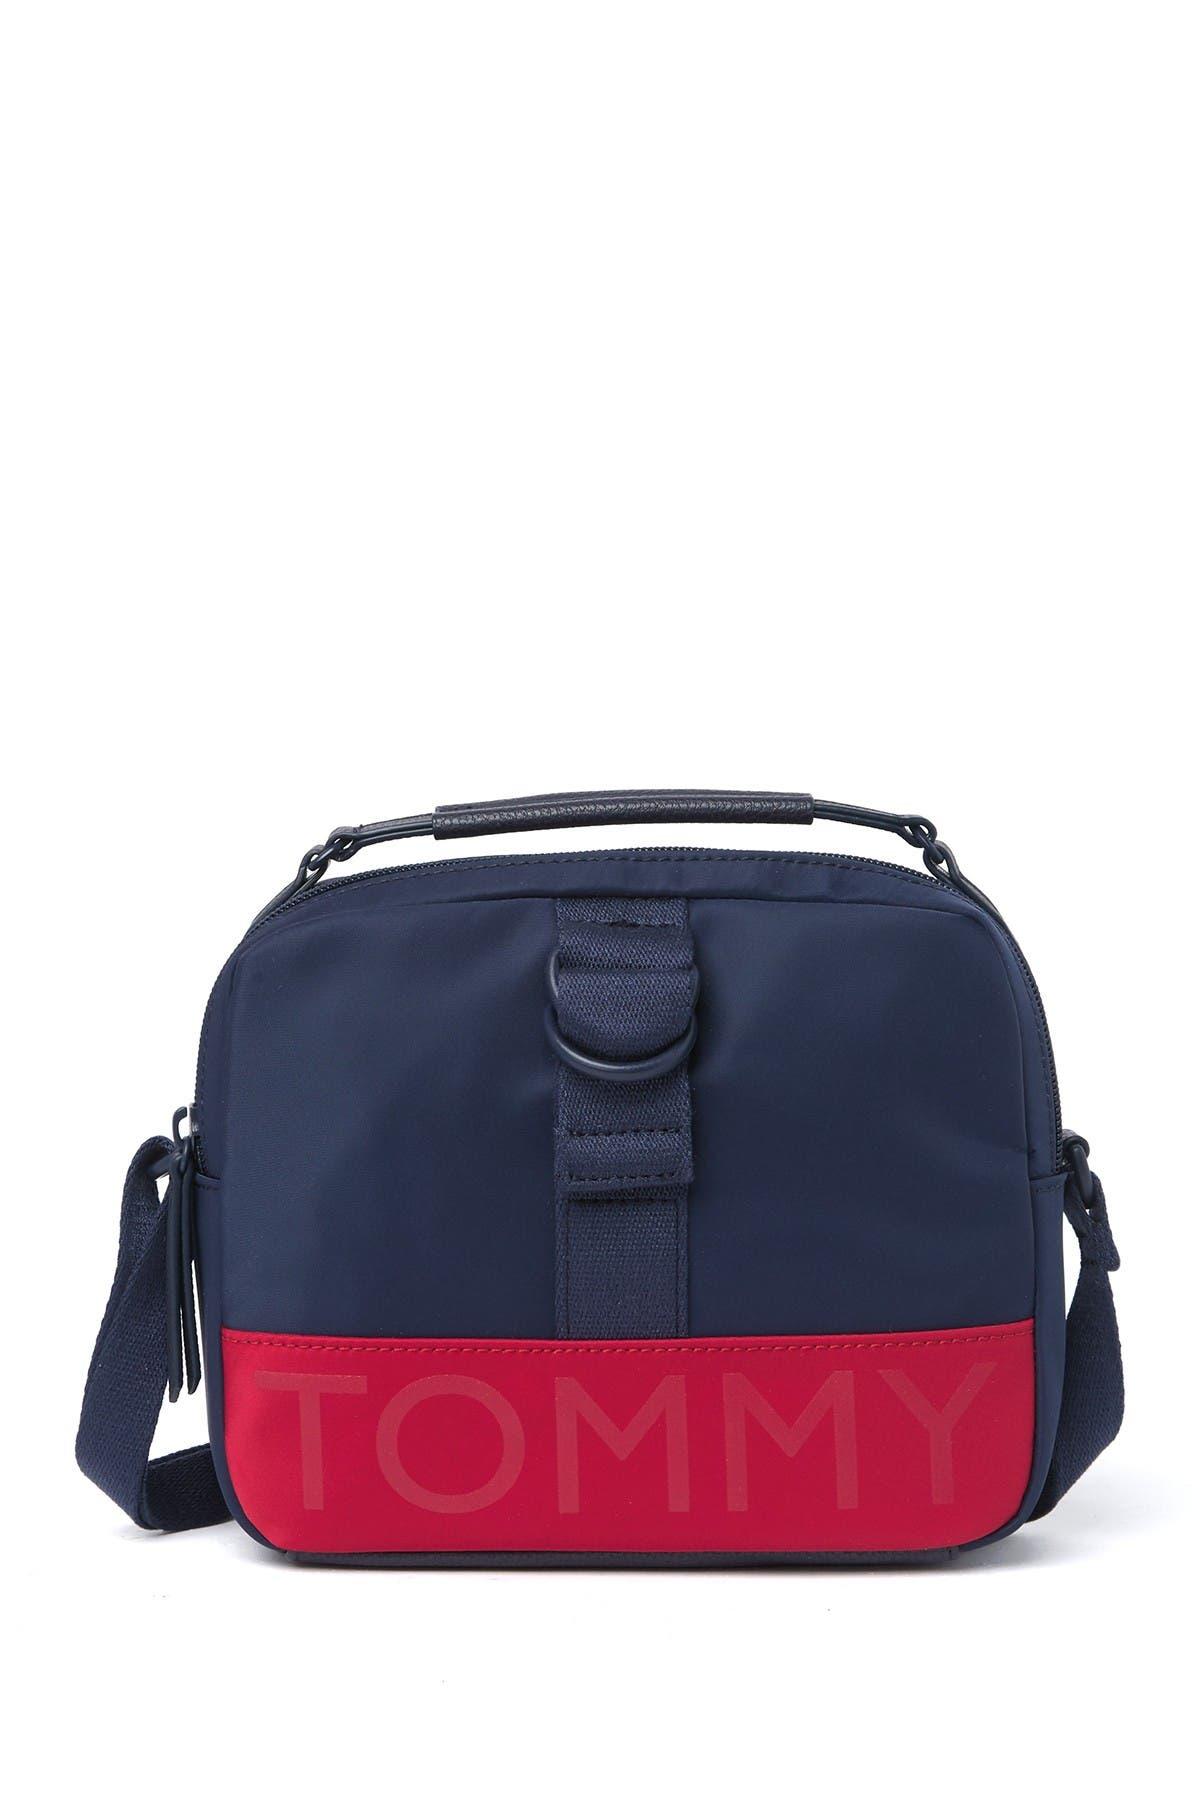 Image of Tommy Hilfiger Kayna II Camera Crossbody Bag